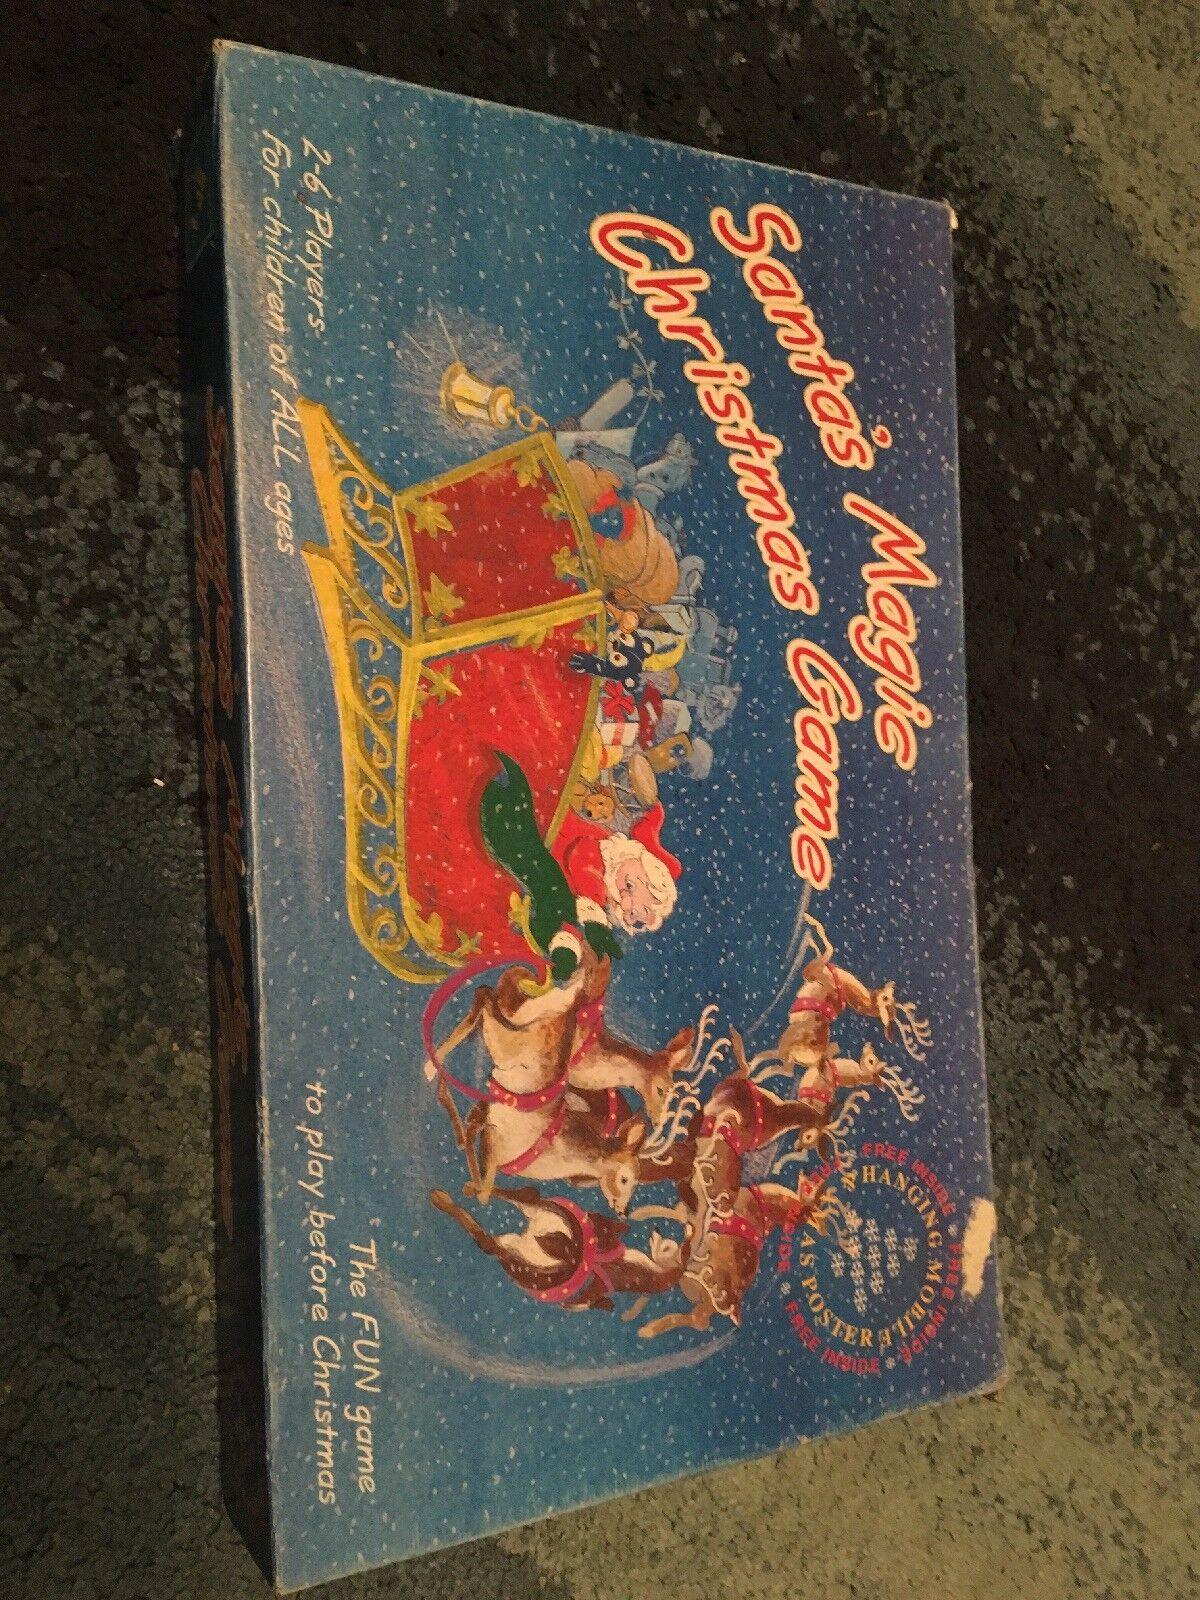 Santa's Magic Christmas Board Game